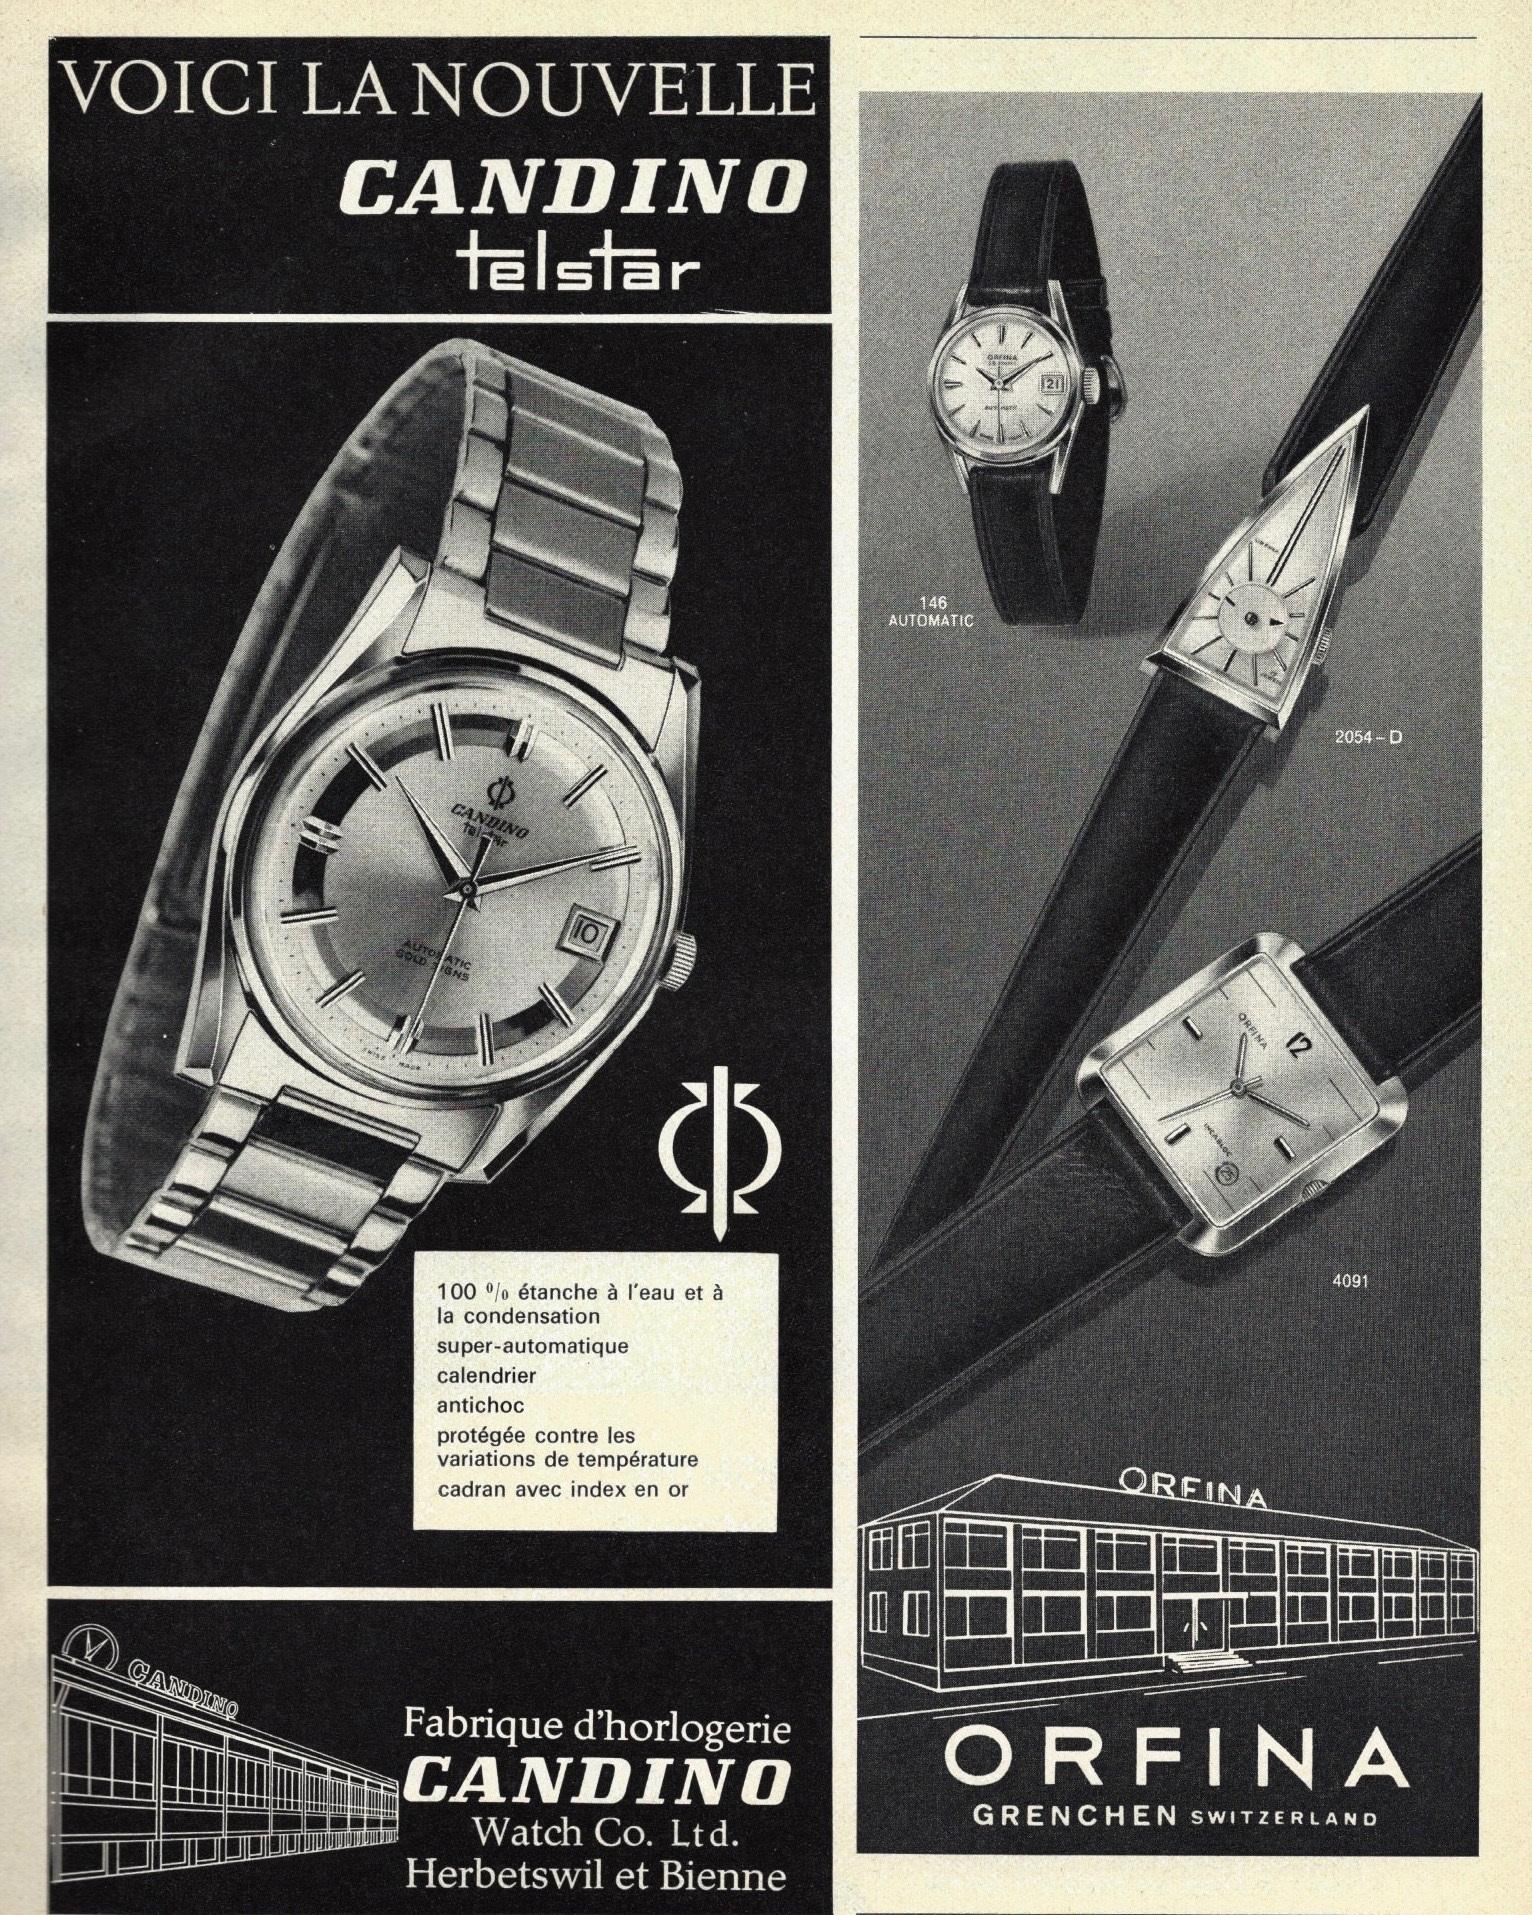 1964 Candino_Telstar_biene_Orfina_grenchen_publicites_horlogeres_1964